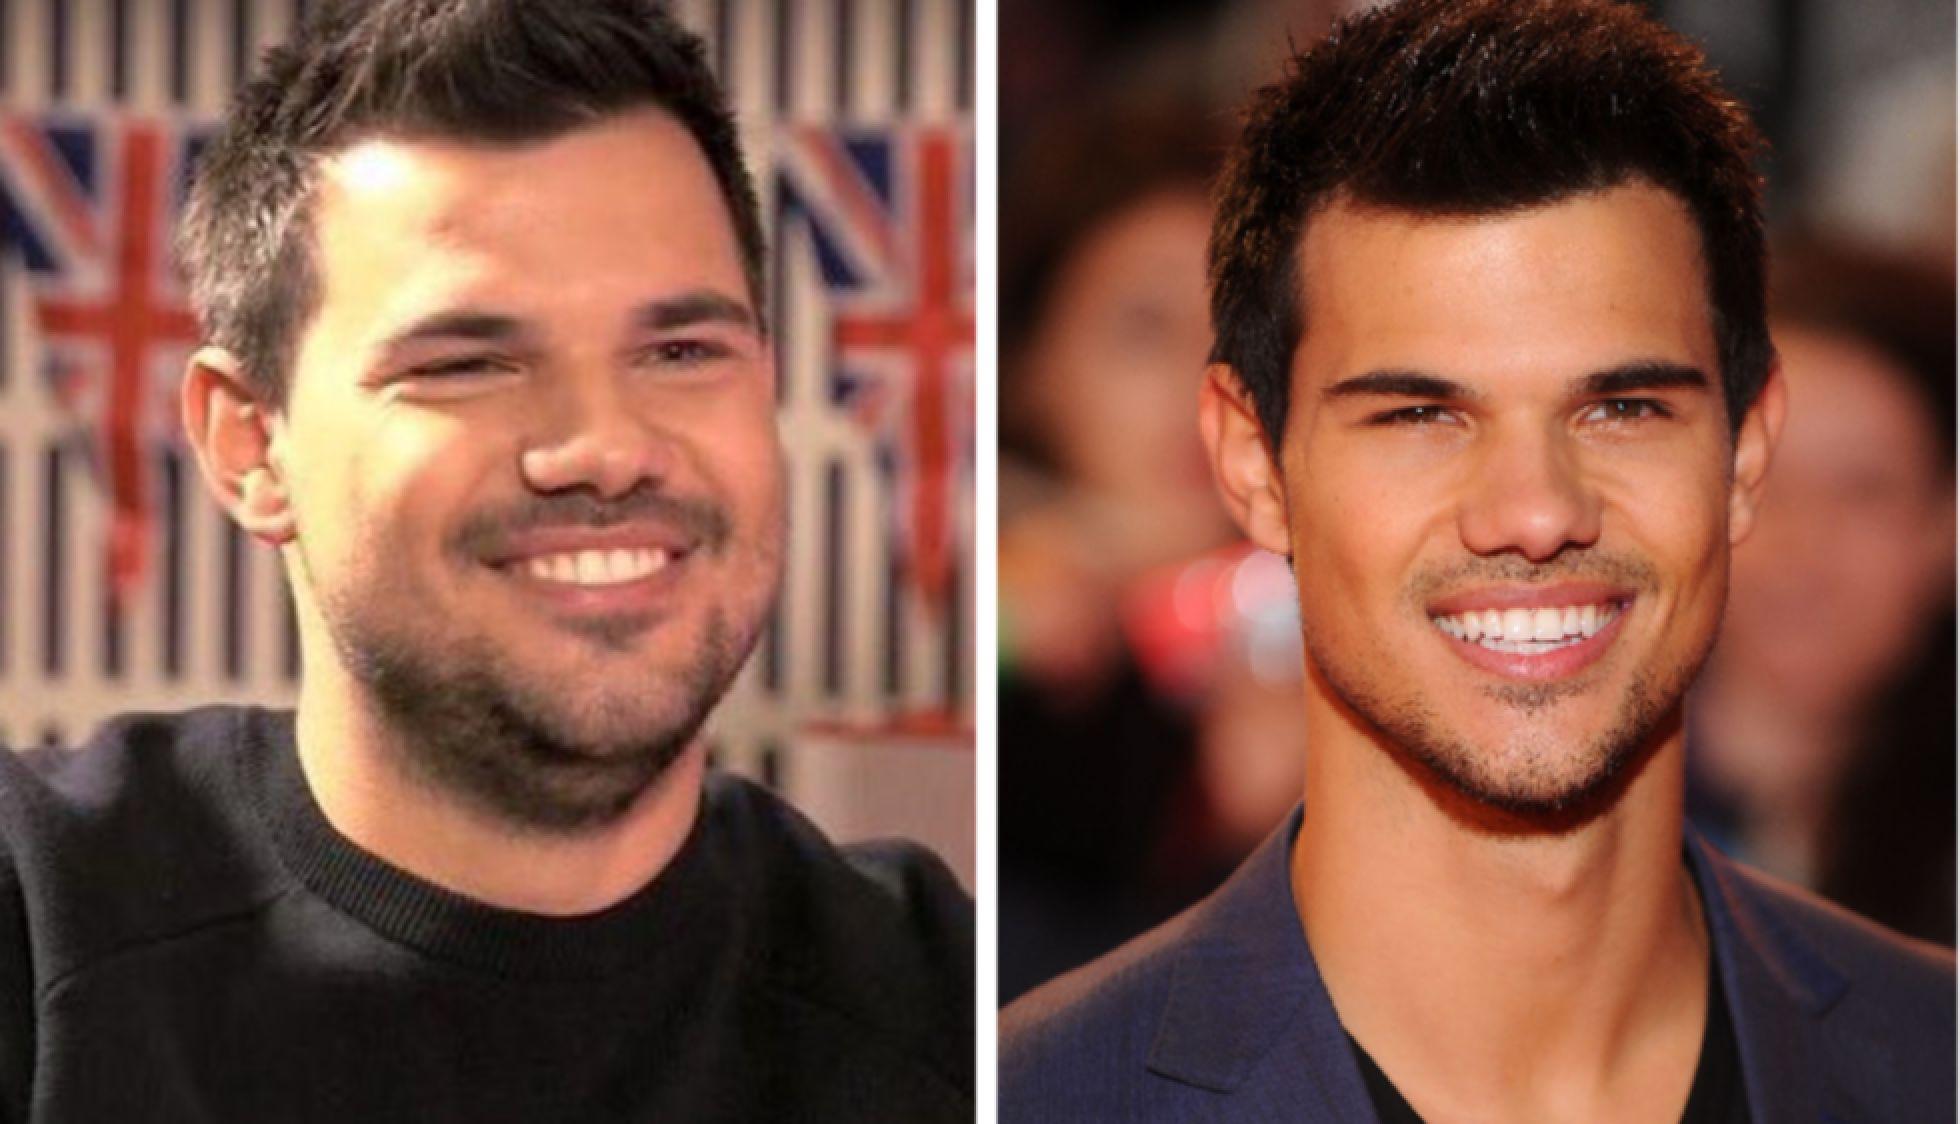 Ver A Taylor Lautner Desnudo Sin Ropa Interior видео